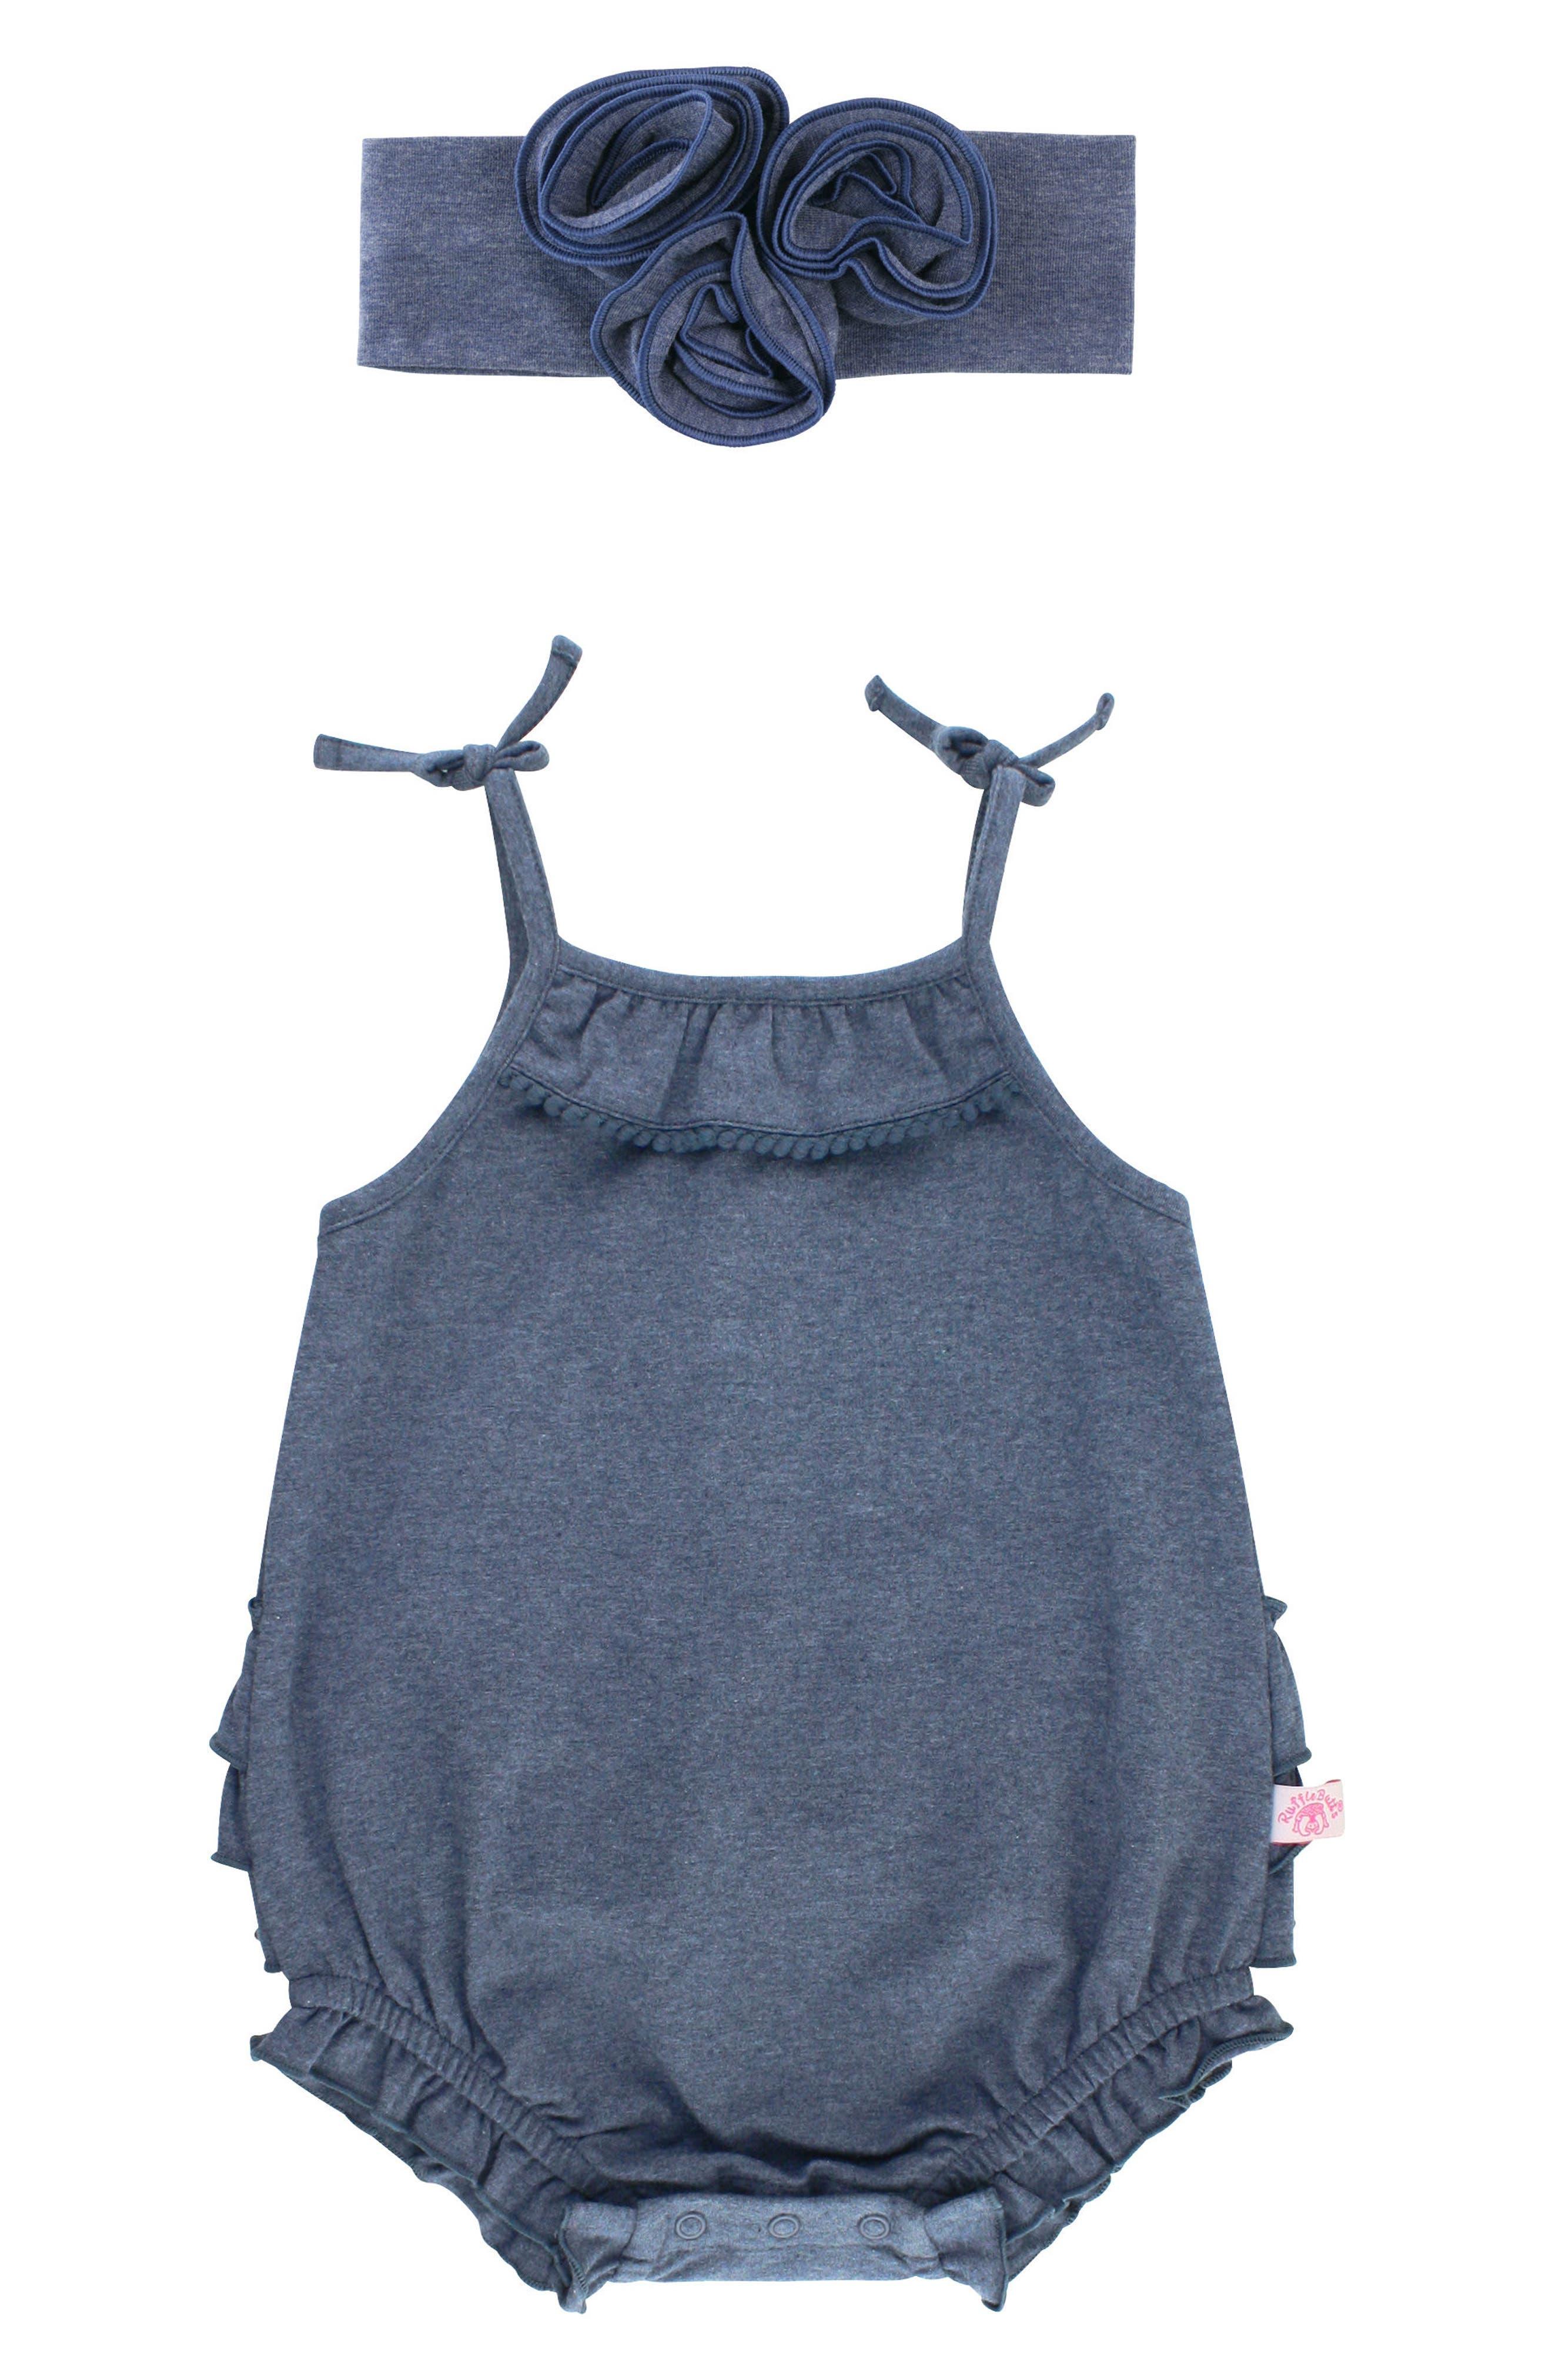 Main Image - RuffleButts Denim Look Bubble Romper & Head Wrap Set (Baby Girls)